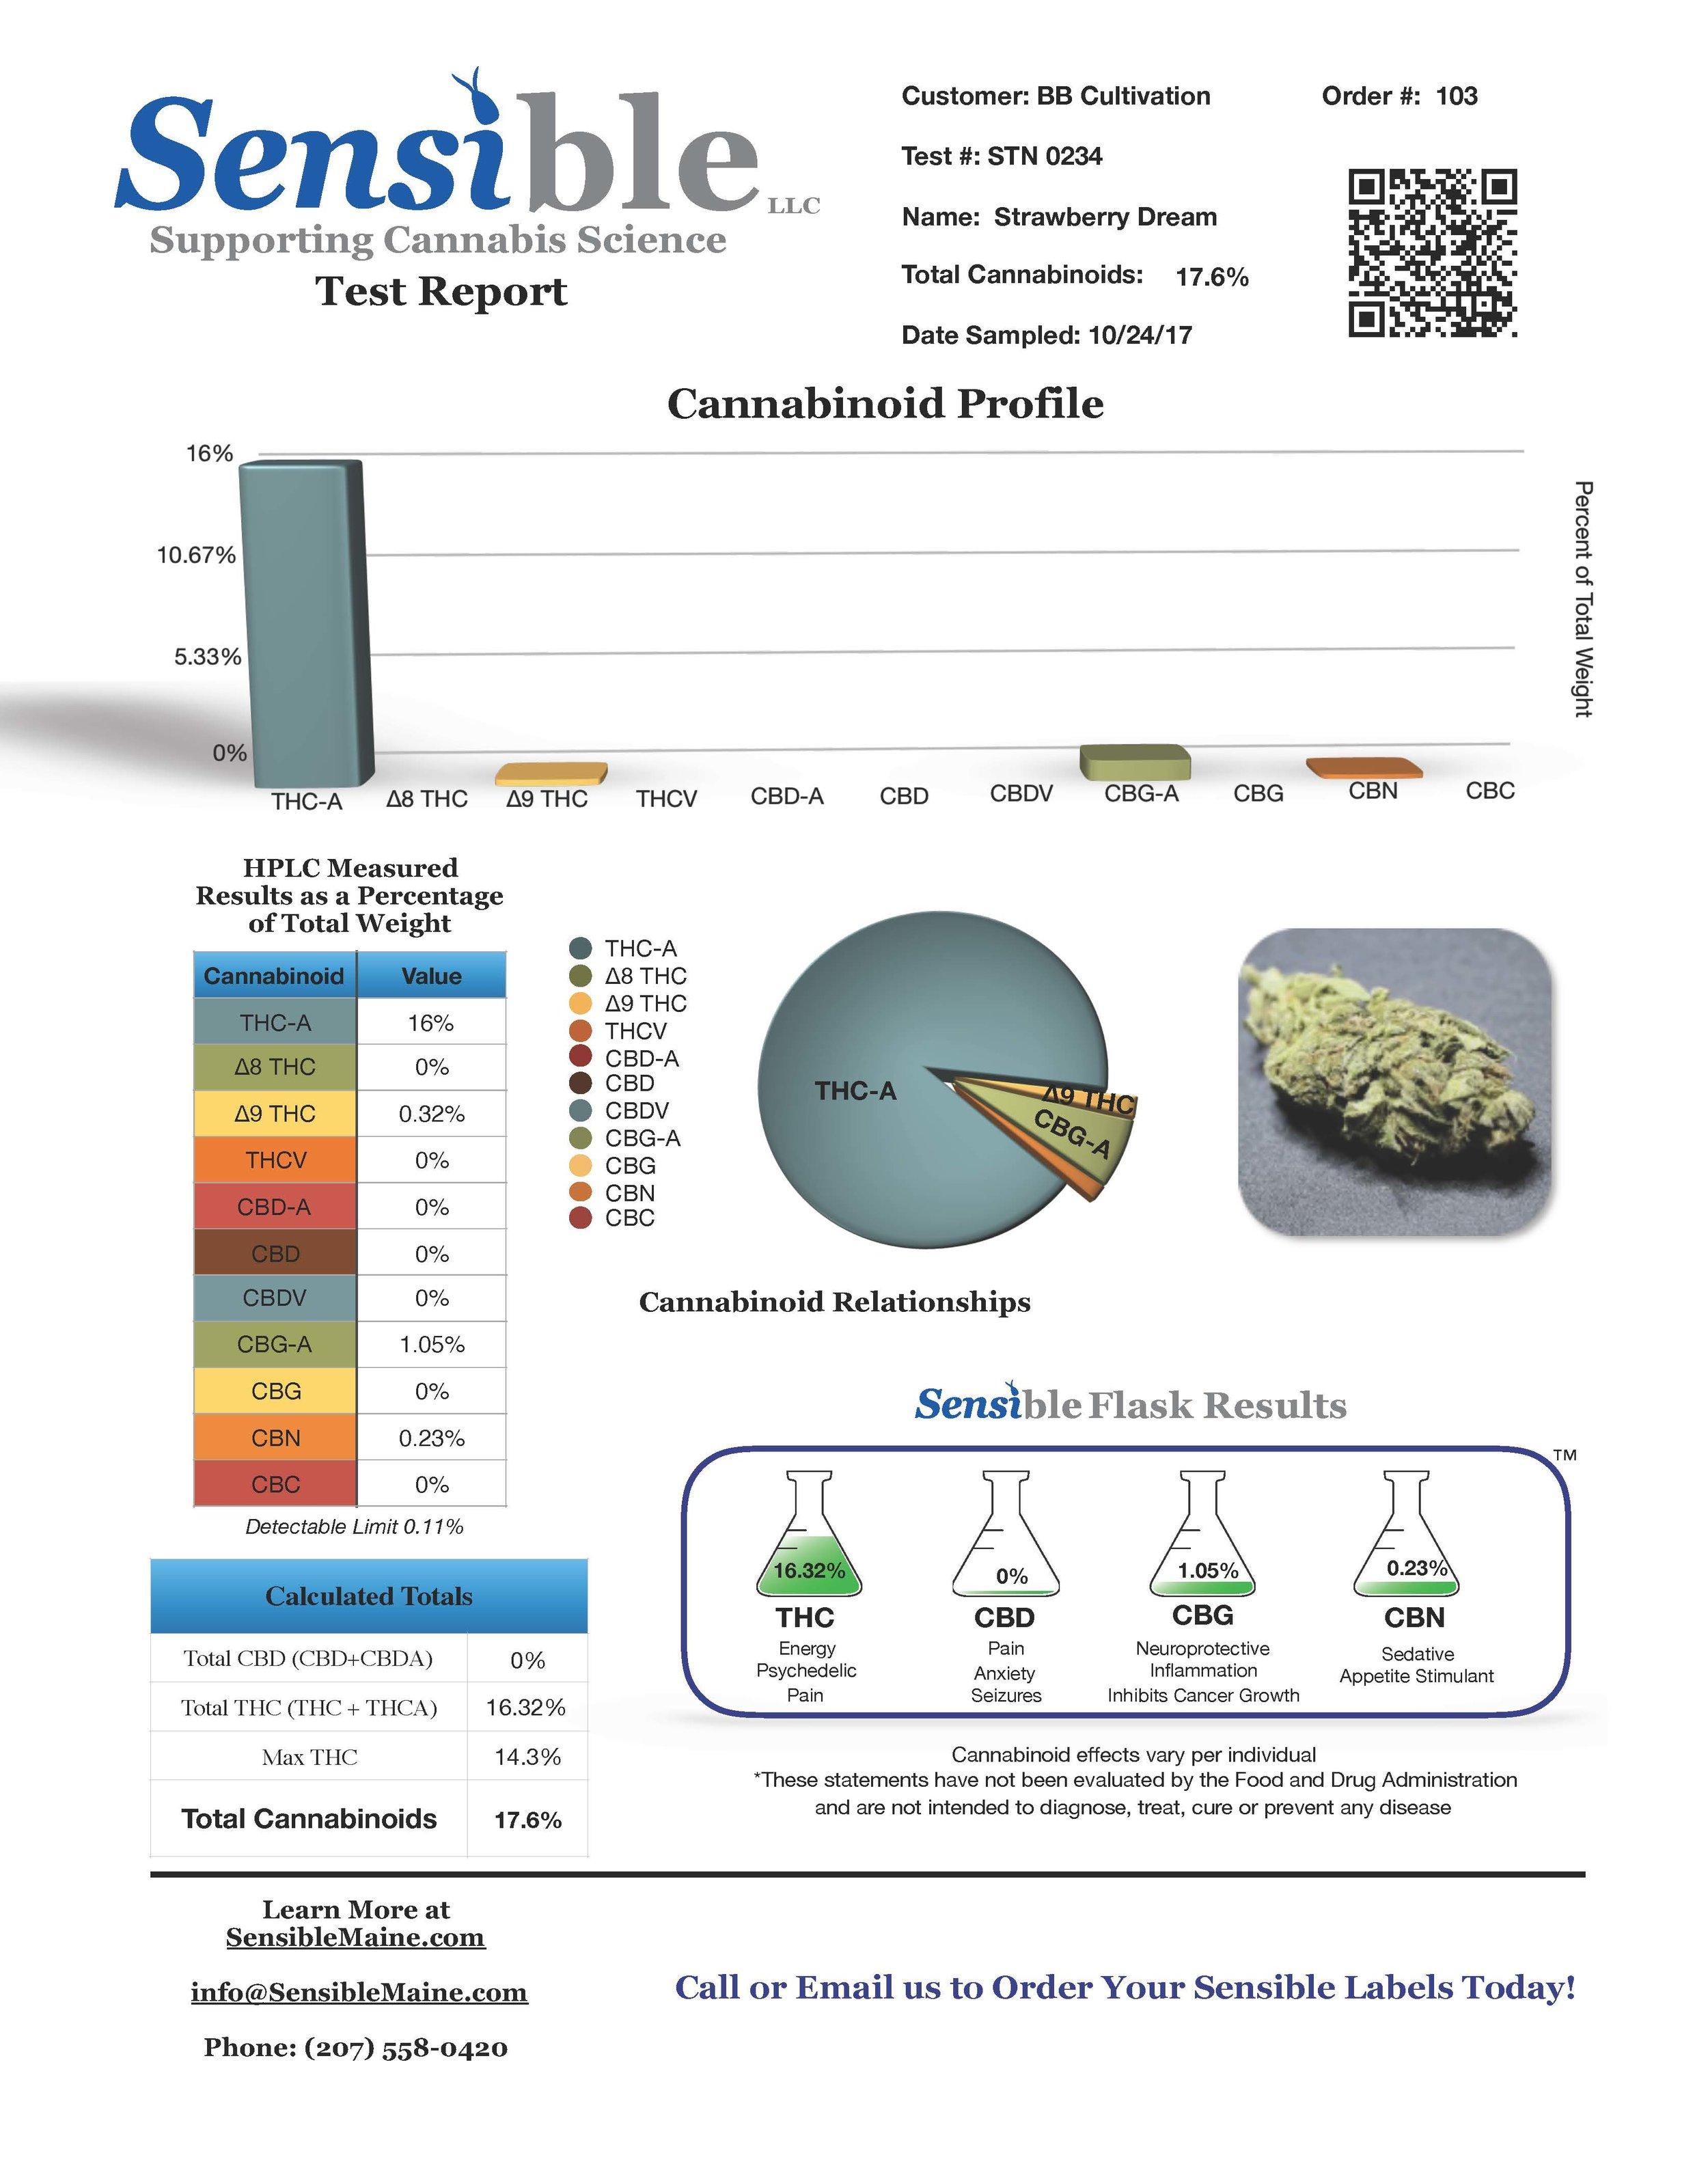 Test Report stn0234.jpg